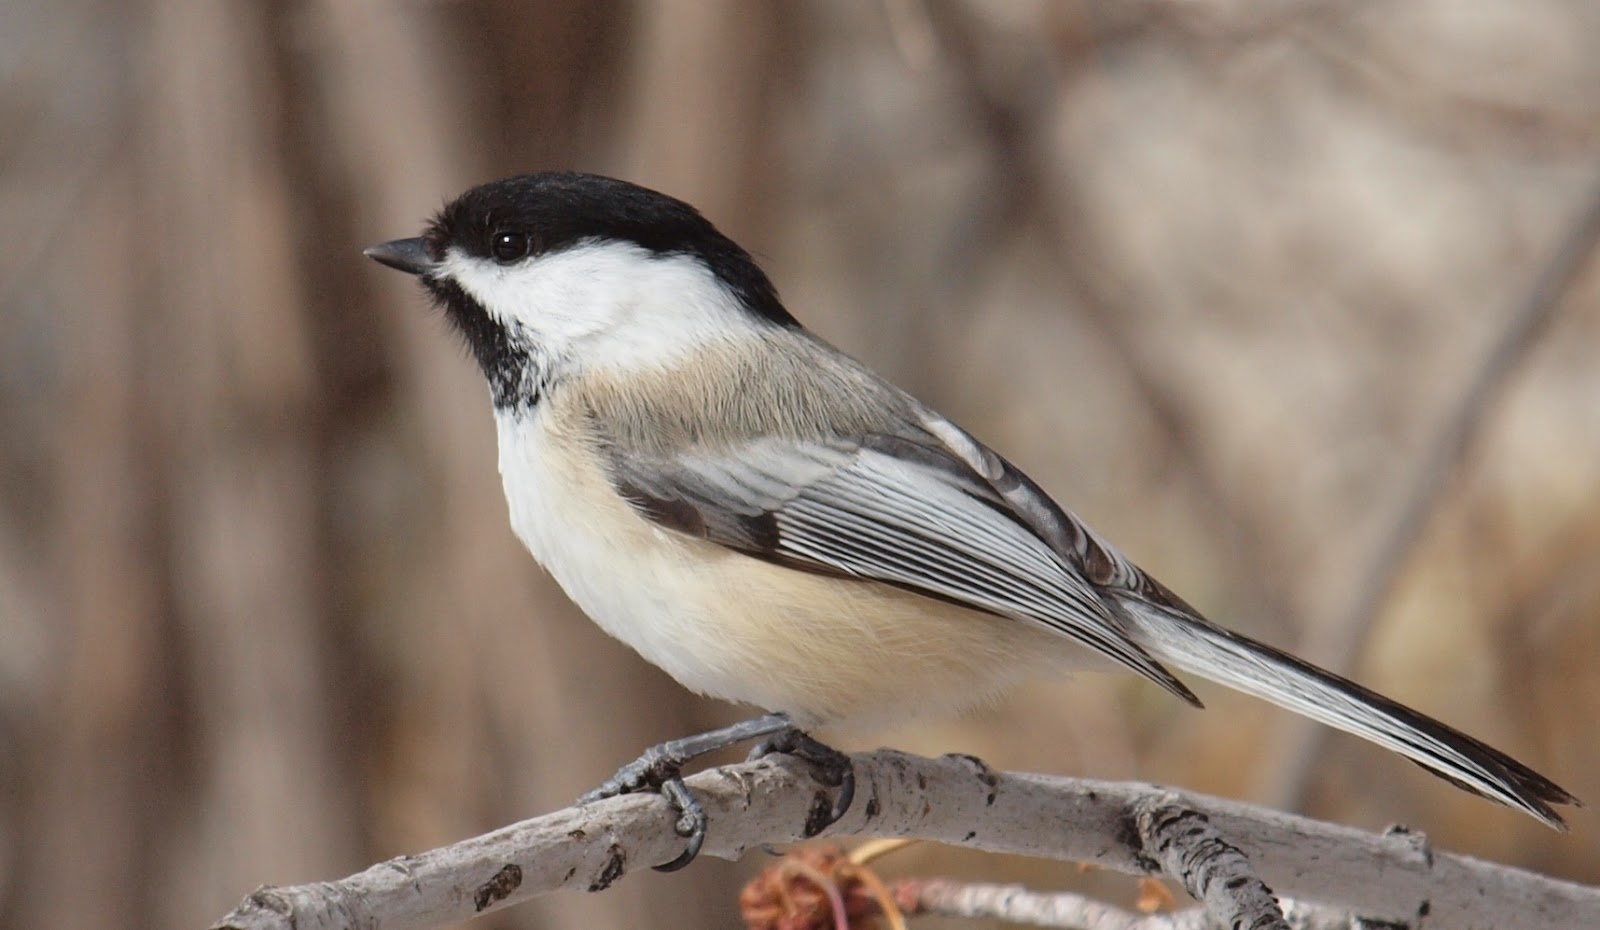 birding is fun backyard birding